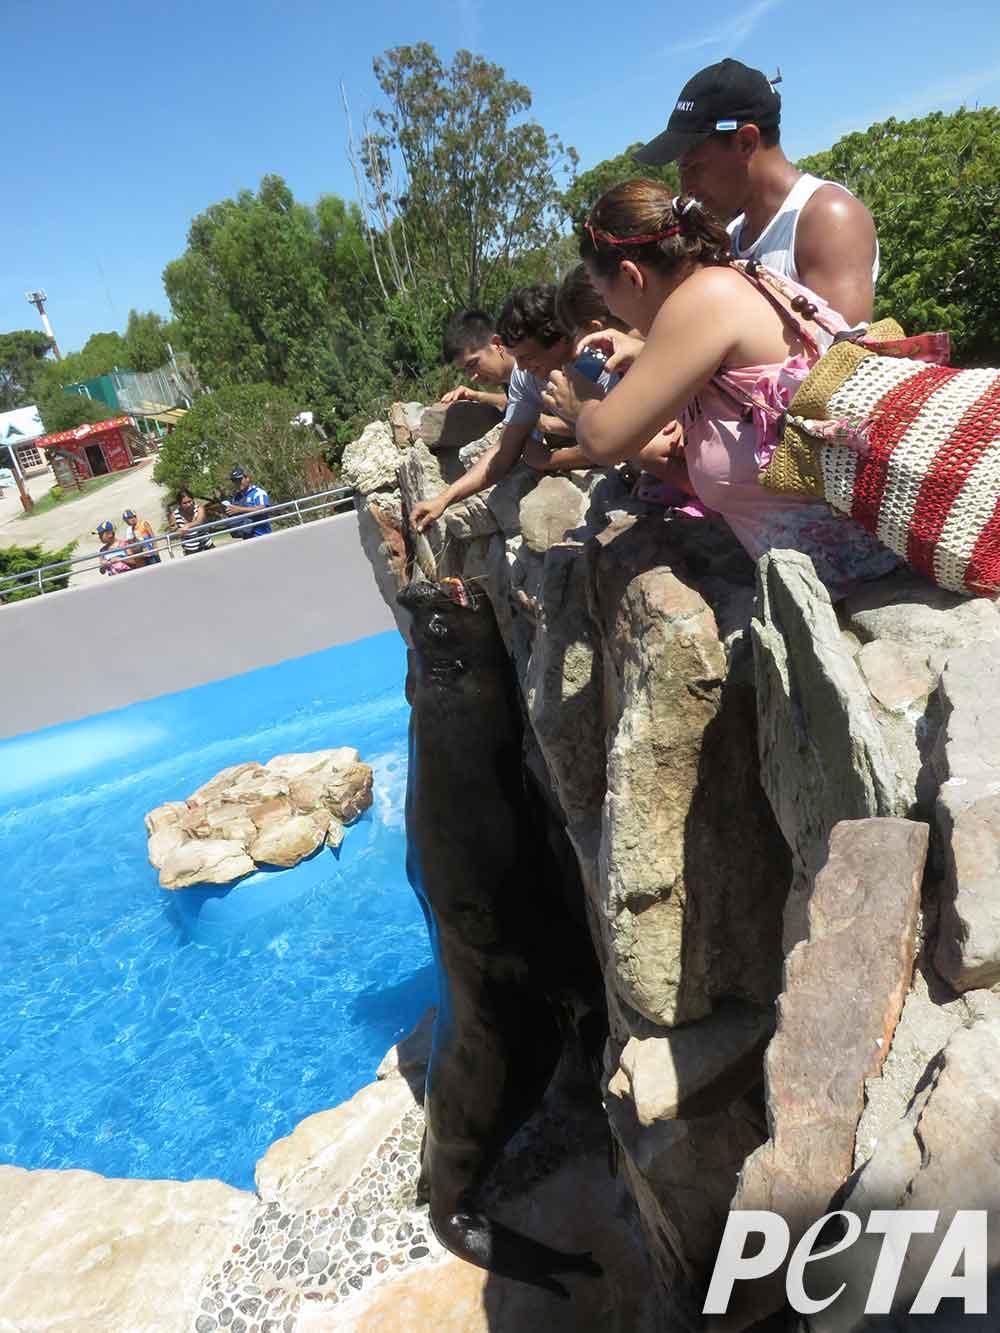 mundo-marino-guests-feeding-sea-lions-close-contact